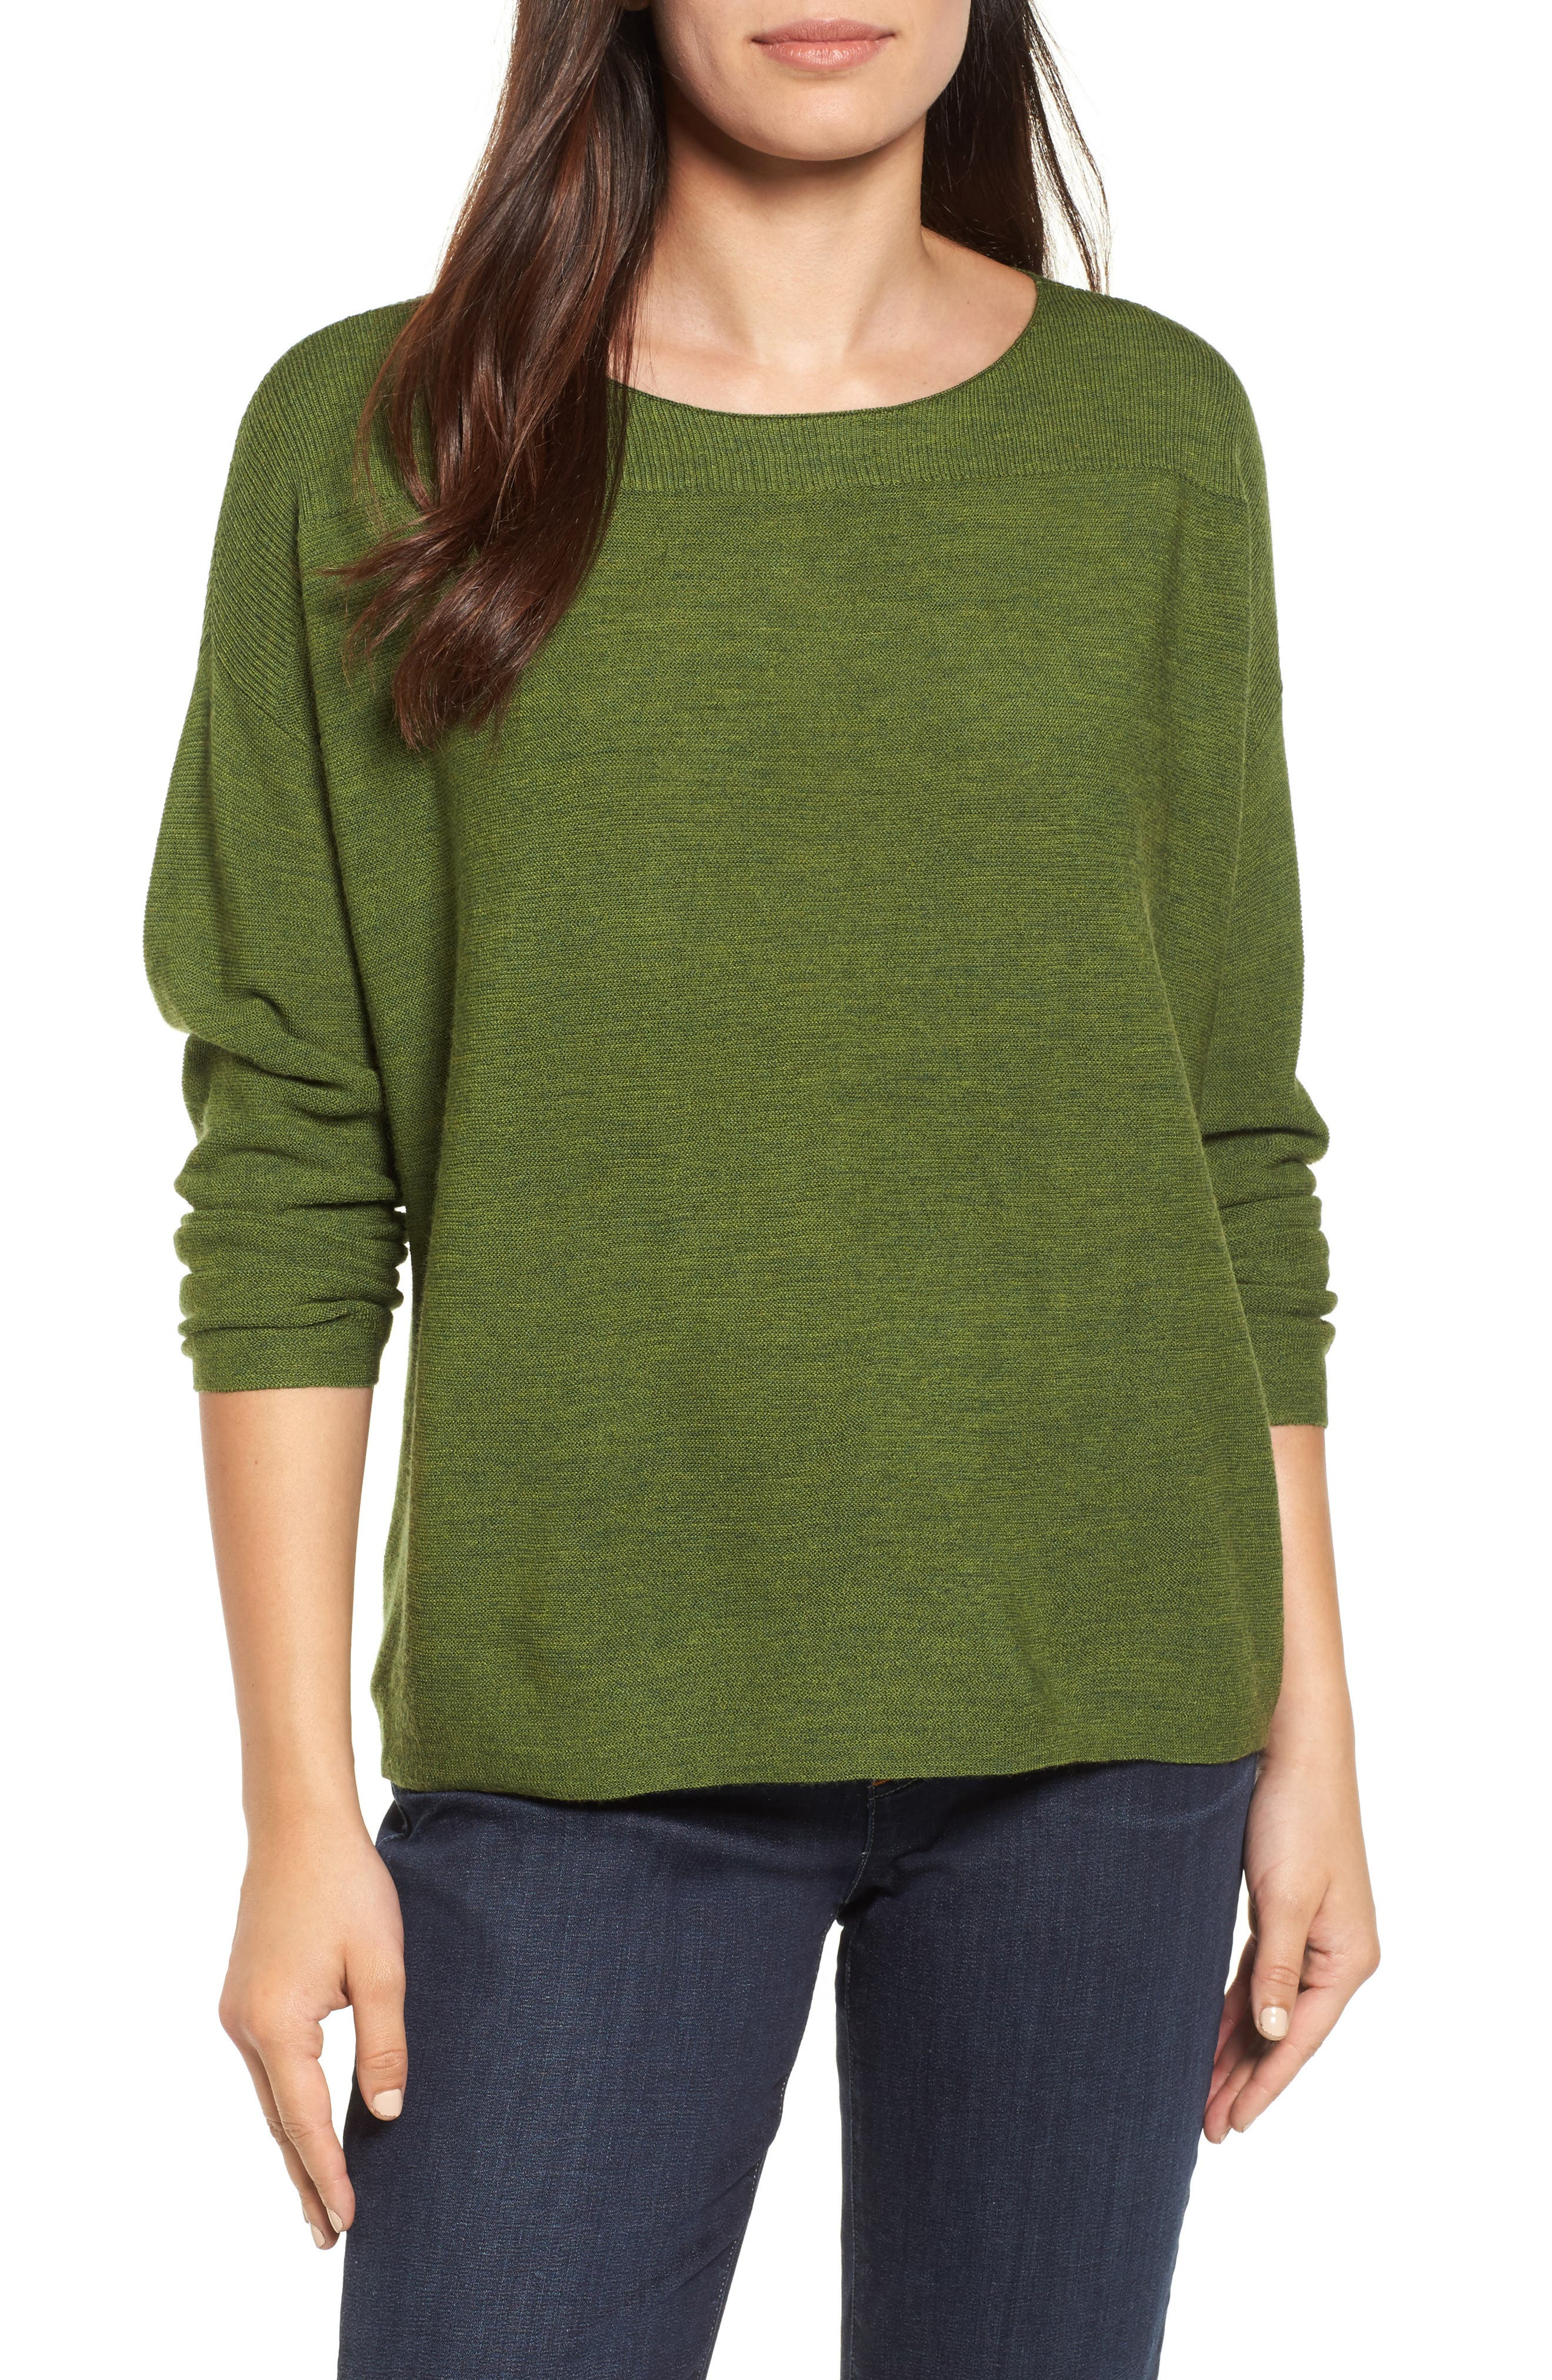 Main Image - Eileen Fisher Mix Stitch Merino Bateau Neck Sweater (Regular & Petite)